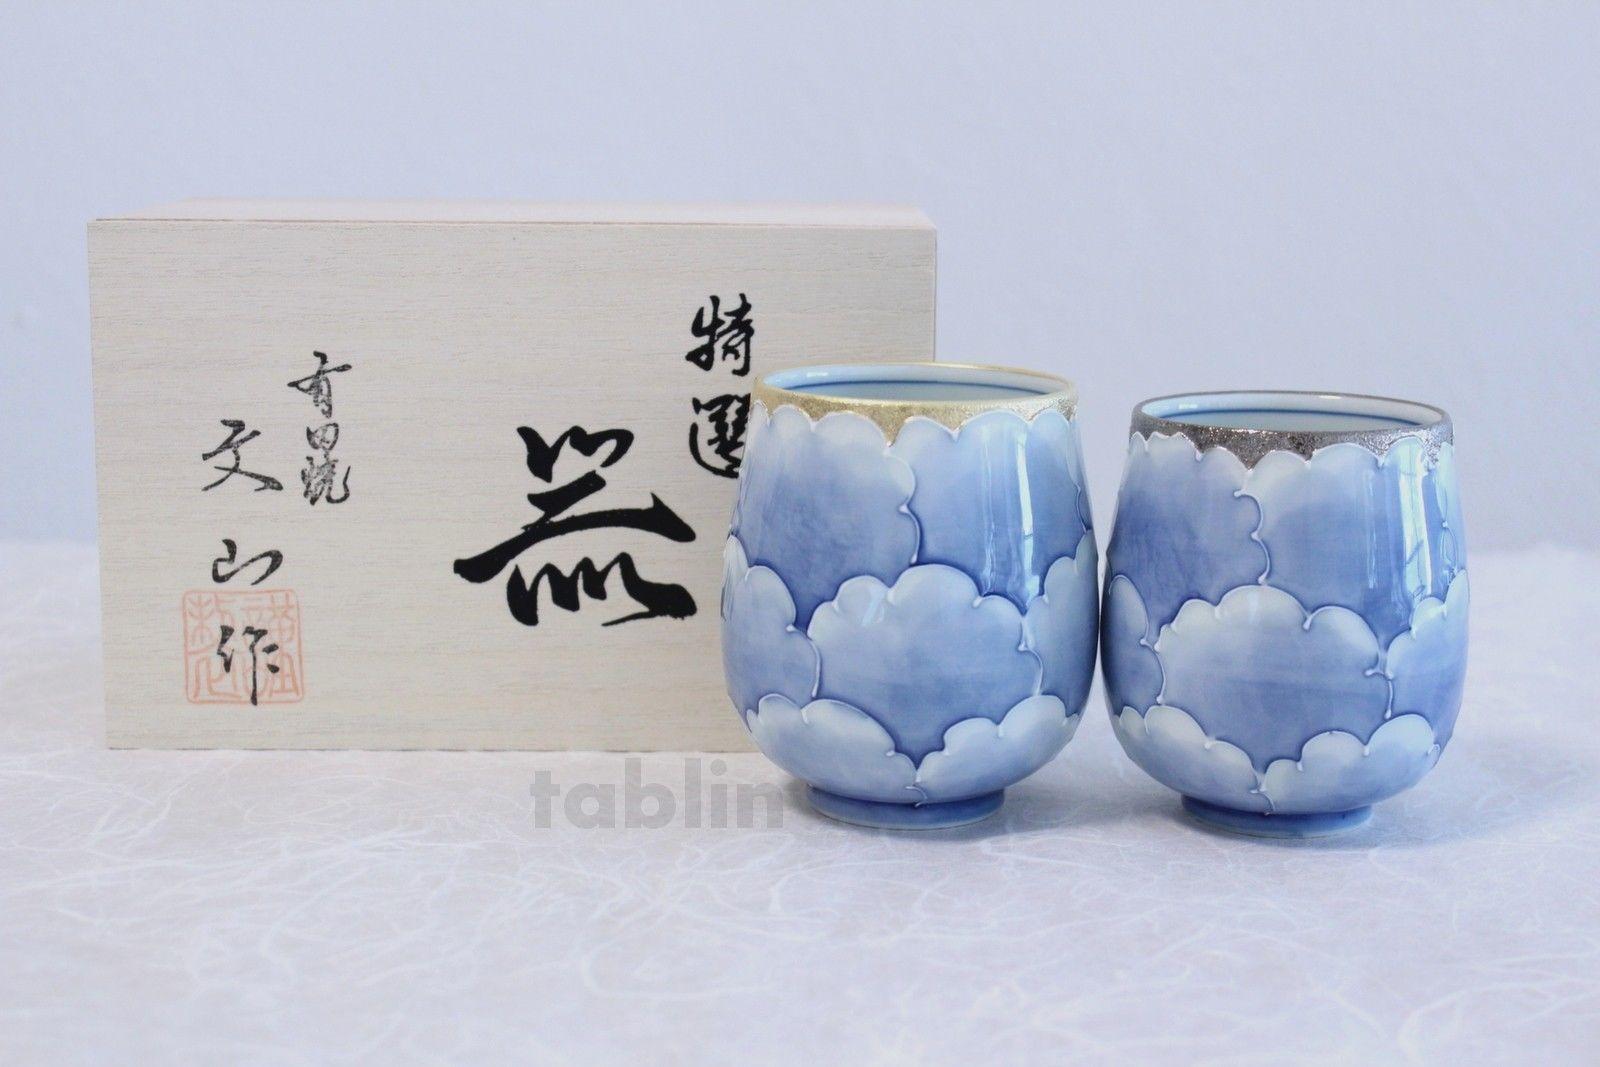 Splendiferous Silver Japanese Tea Set Bamboo Handle Japanese Tea Set Cast Iron Arita Porcelain Yunomi Japanese Tea Cup Bota G Silver Arita Porcelain Yunomi Japanese Tea Cup Bota G houzz-03 Japanese Tea Set